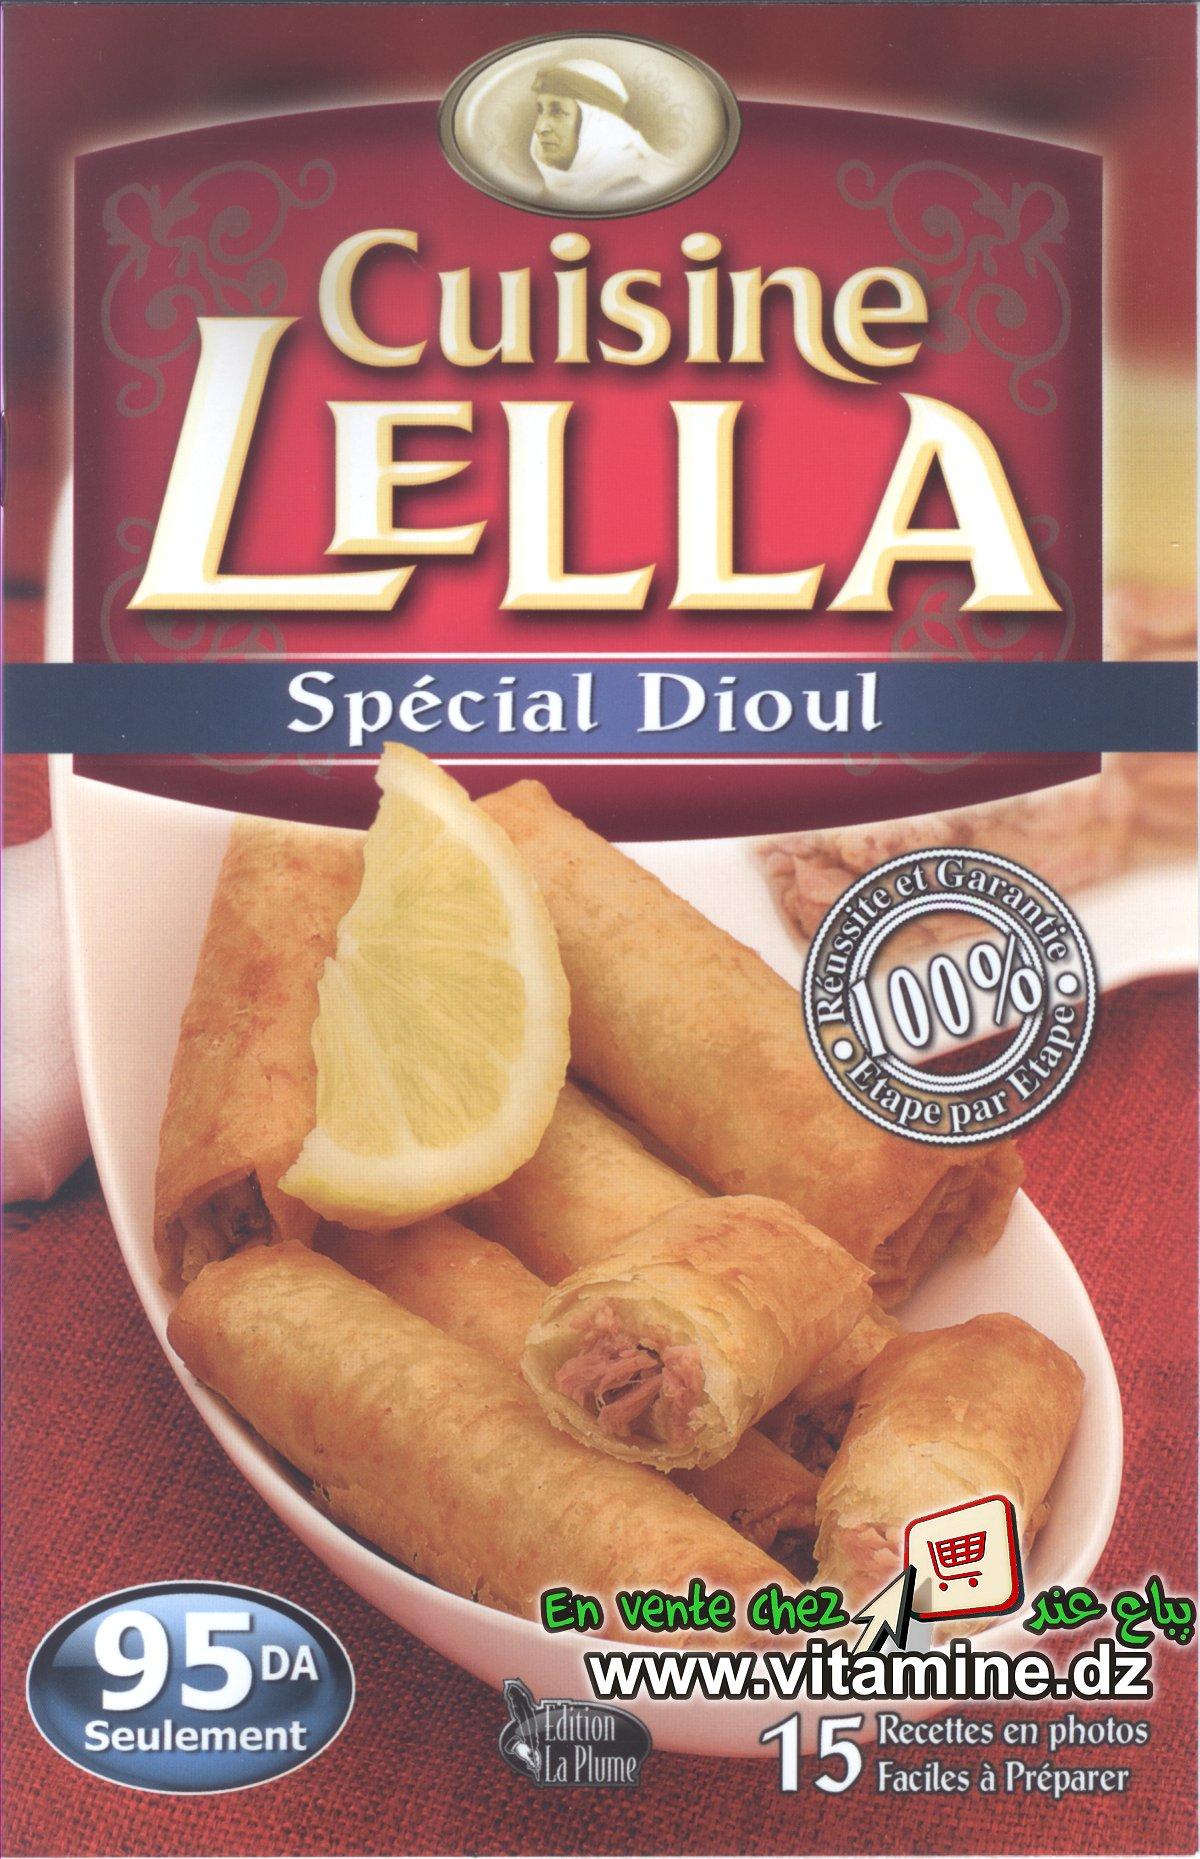 Cuisine Lella - Spécial dioul